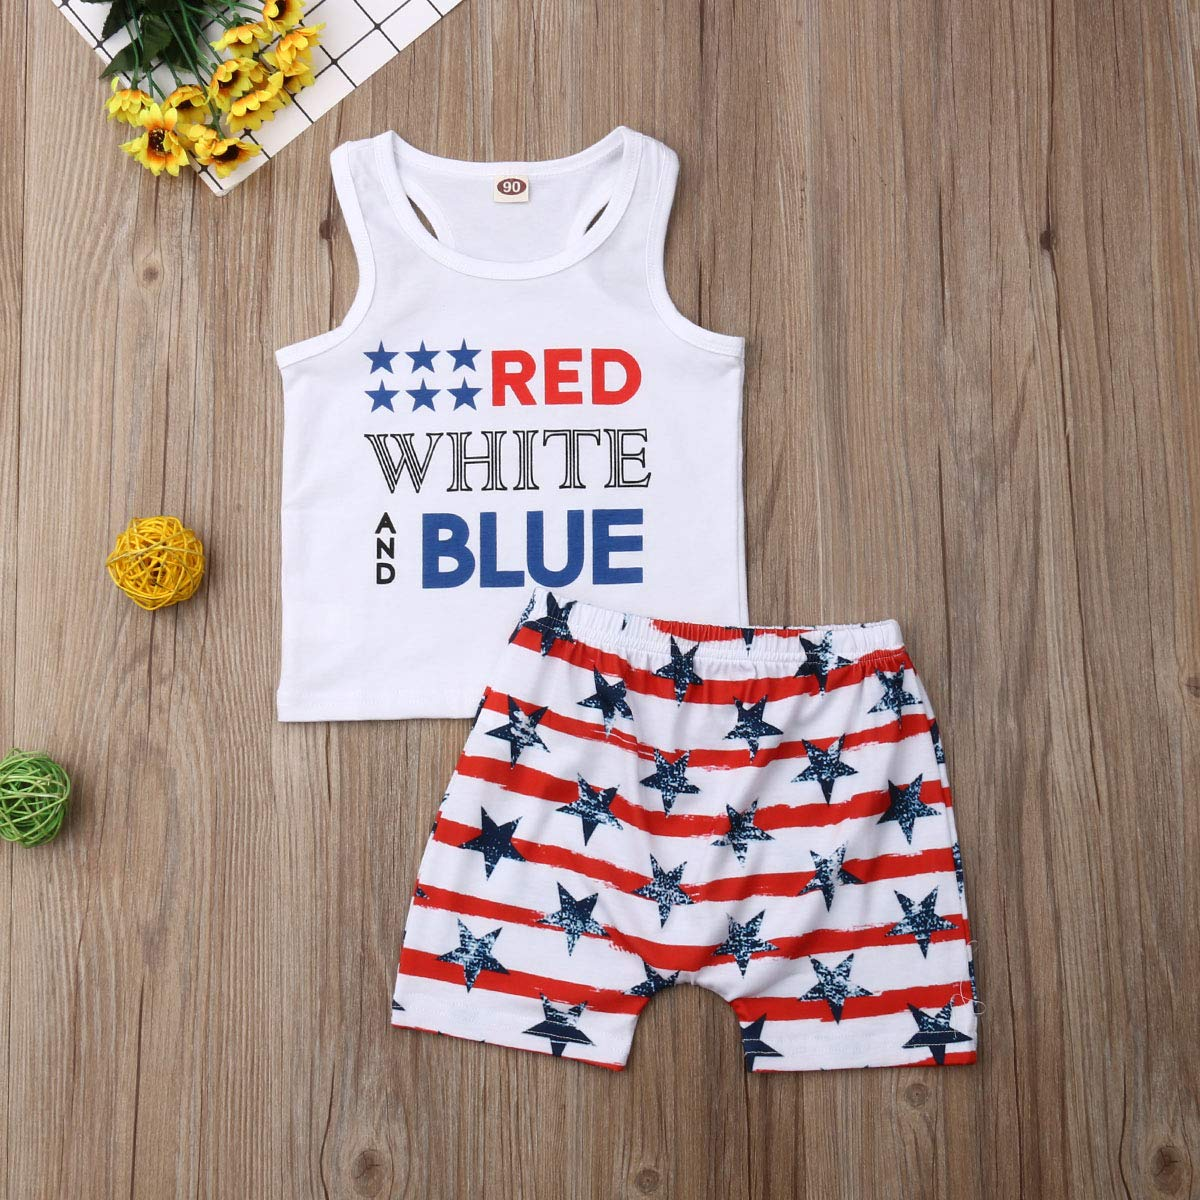 2Pcs//Set Fashion Toddler Kids Baby Girl Boy Summer Outfits Sleeveless Tassel T-Shirt Top+Floral Shorts Clothes Set 6M-5T